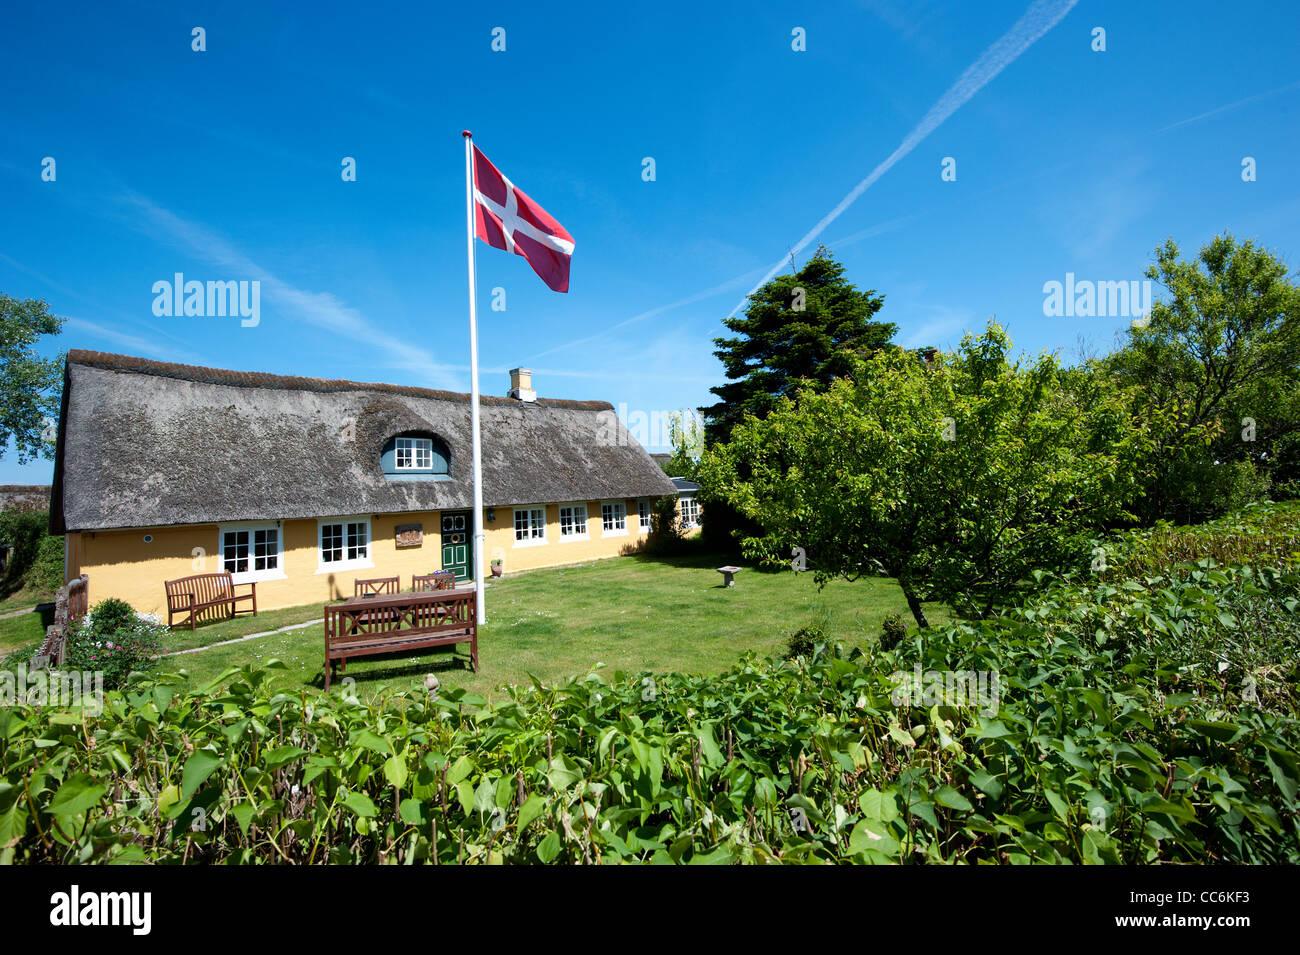 house and garden with danish flag in sonderho fano island